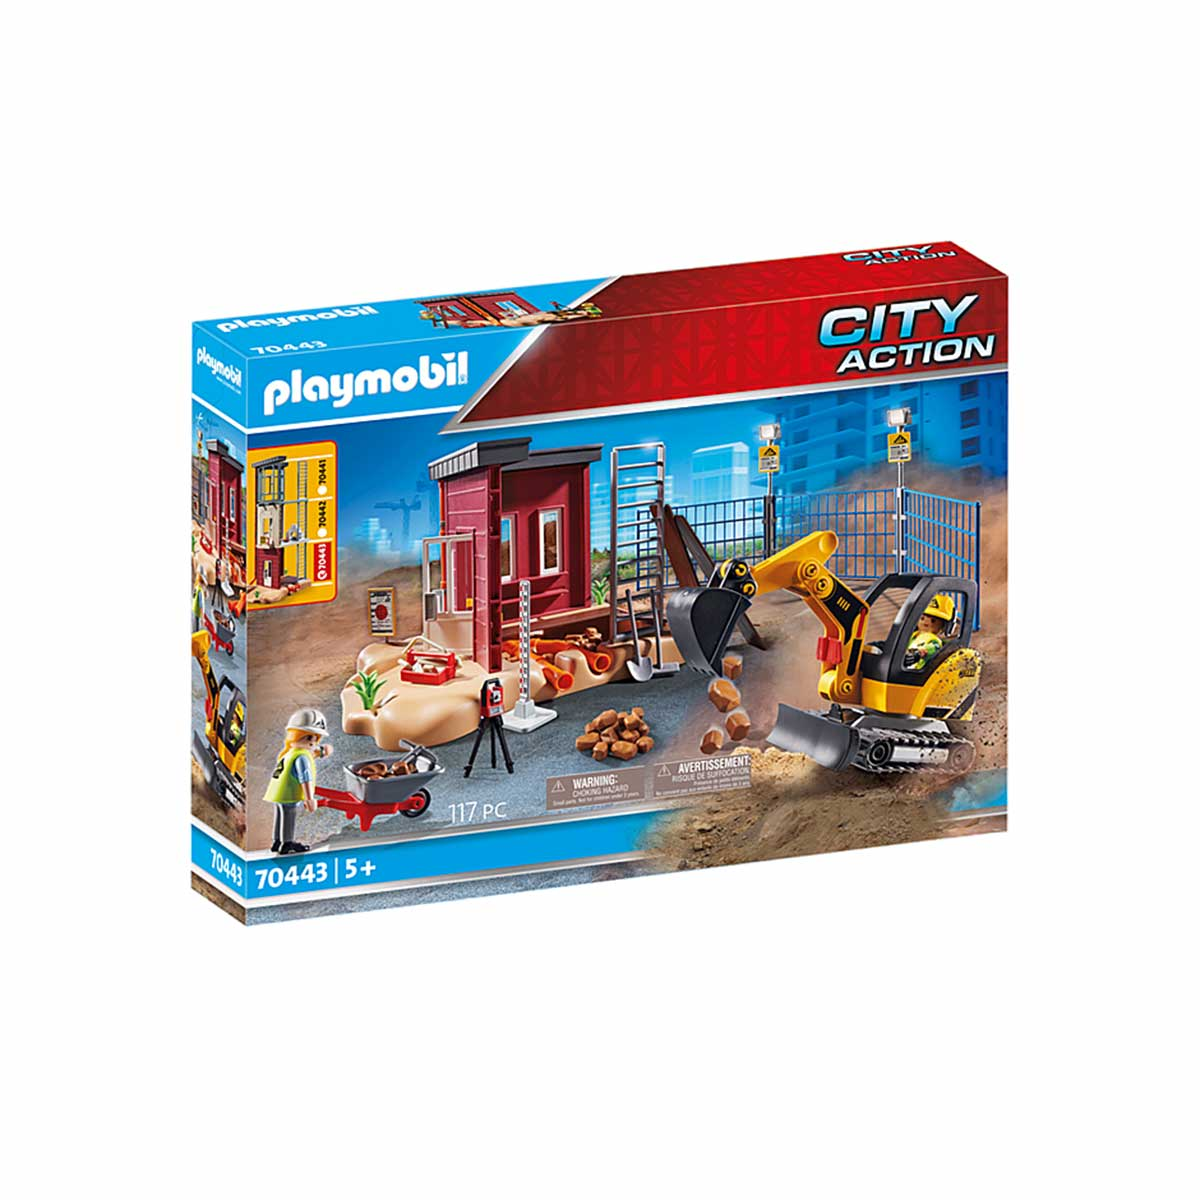 Playmobil 70443, Small Excavator